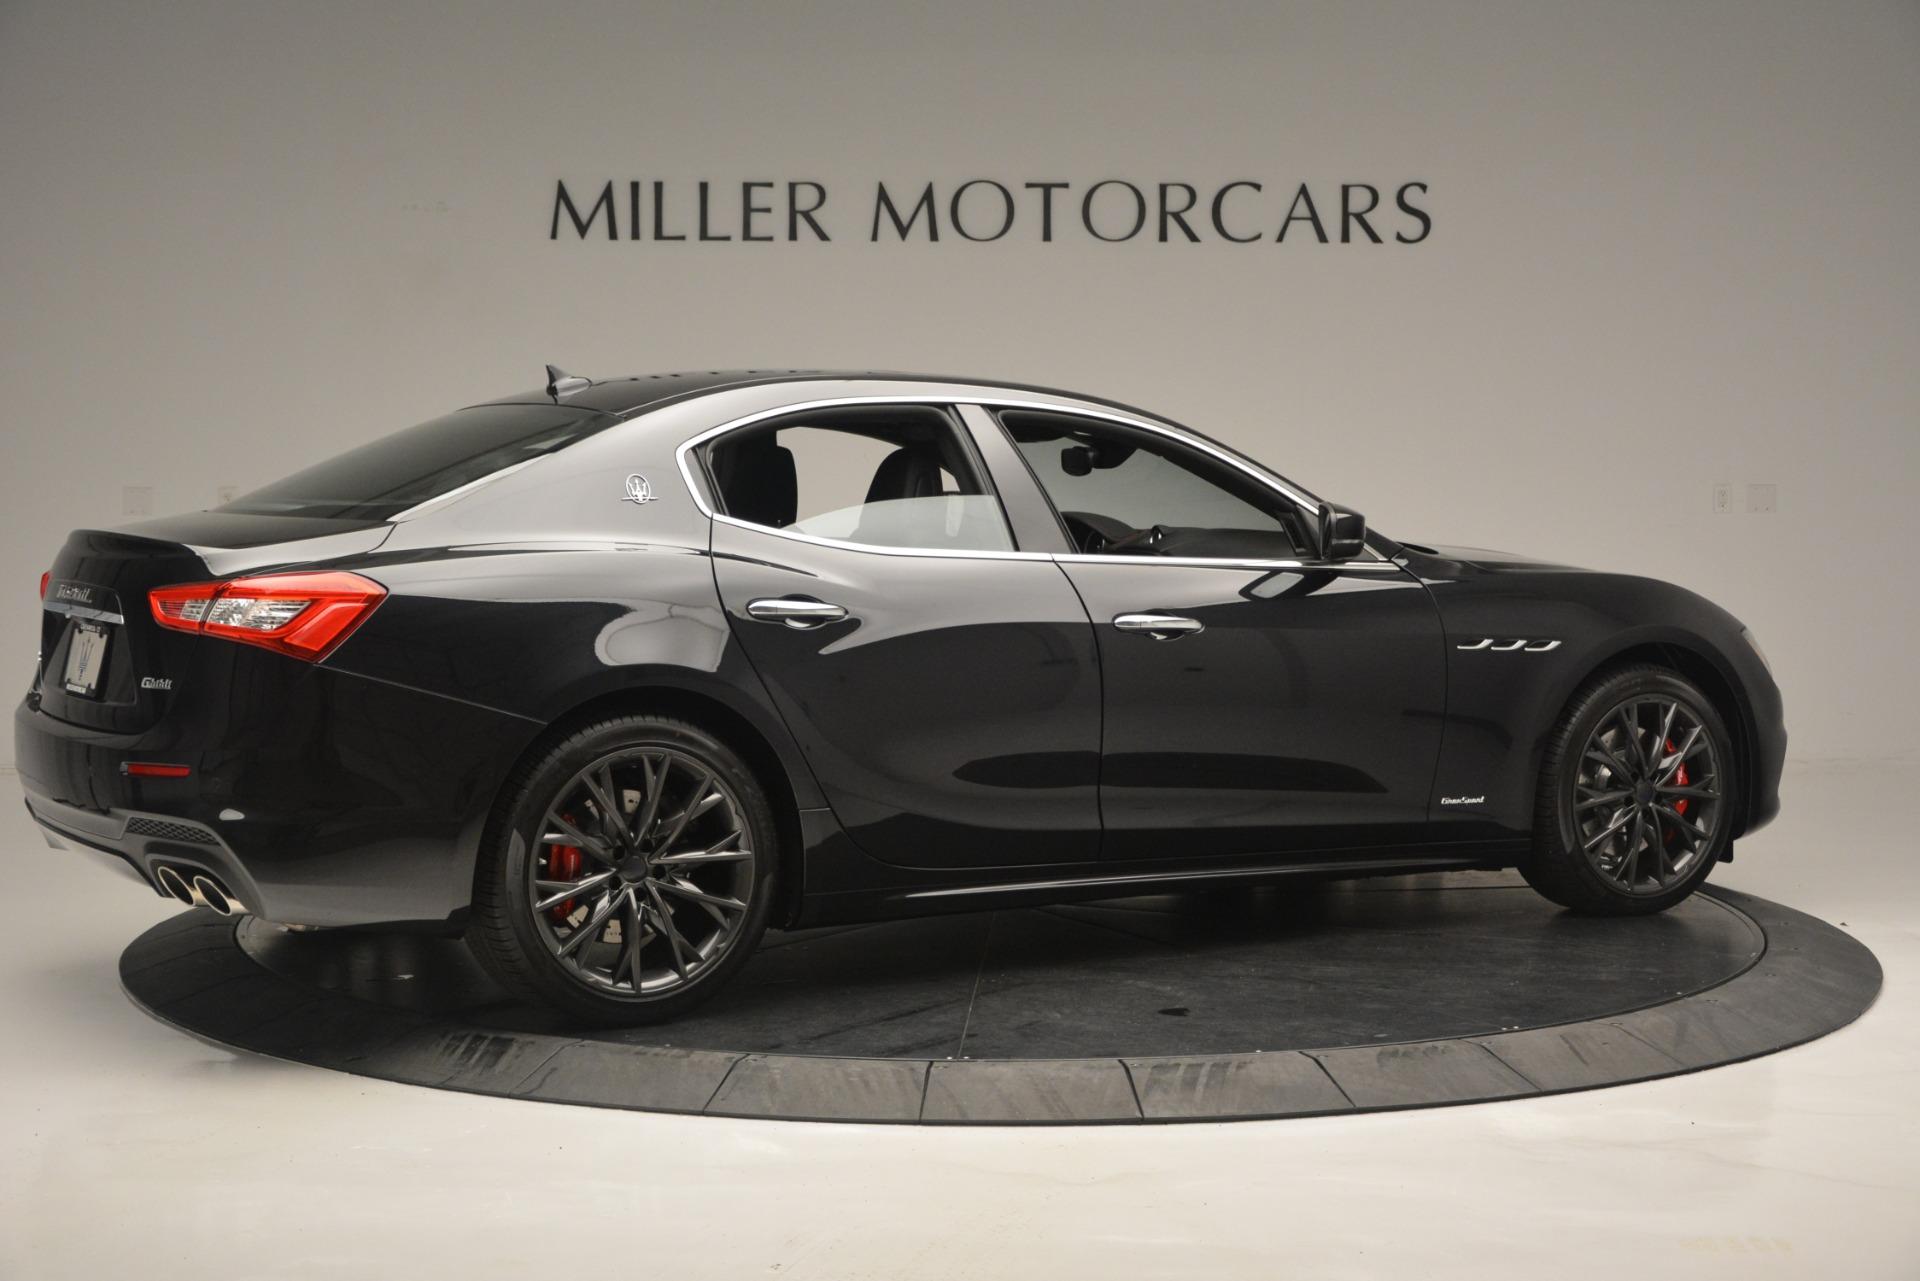 New 2019 Maserati Ghibli S Q4 GranSport For Sale In Greenwich, CT. Alfa Romeo of Greenwich, M2219 2765_p8